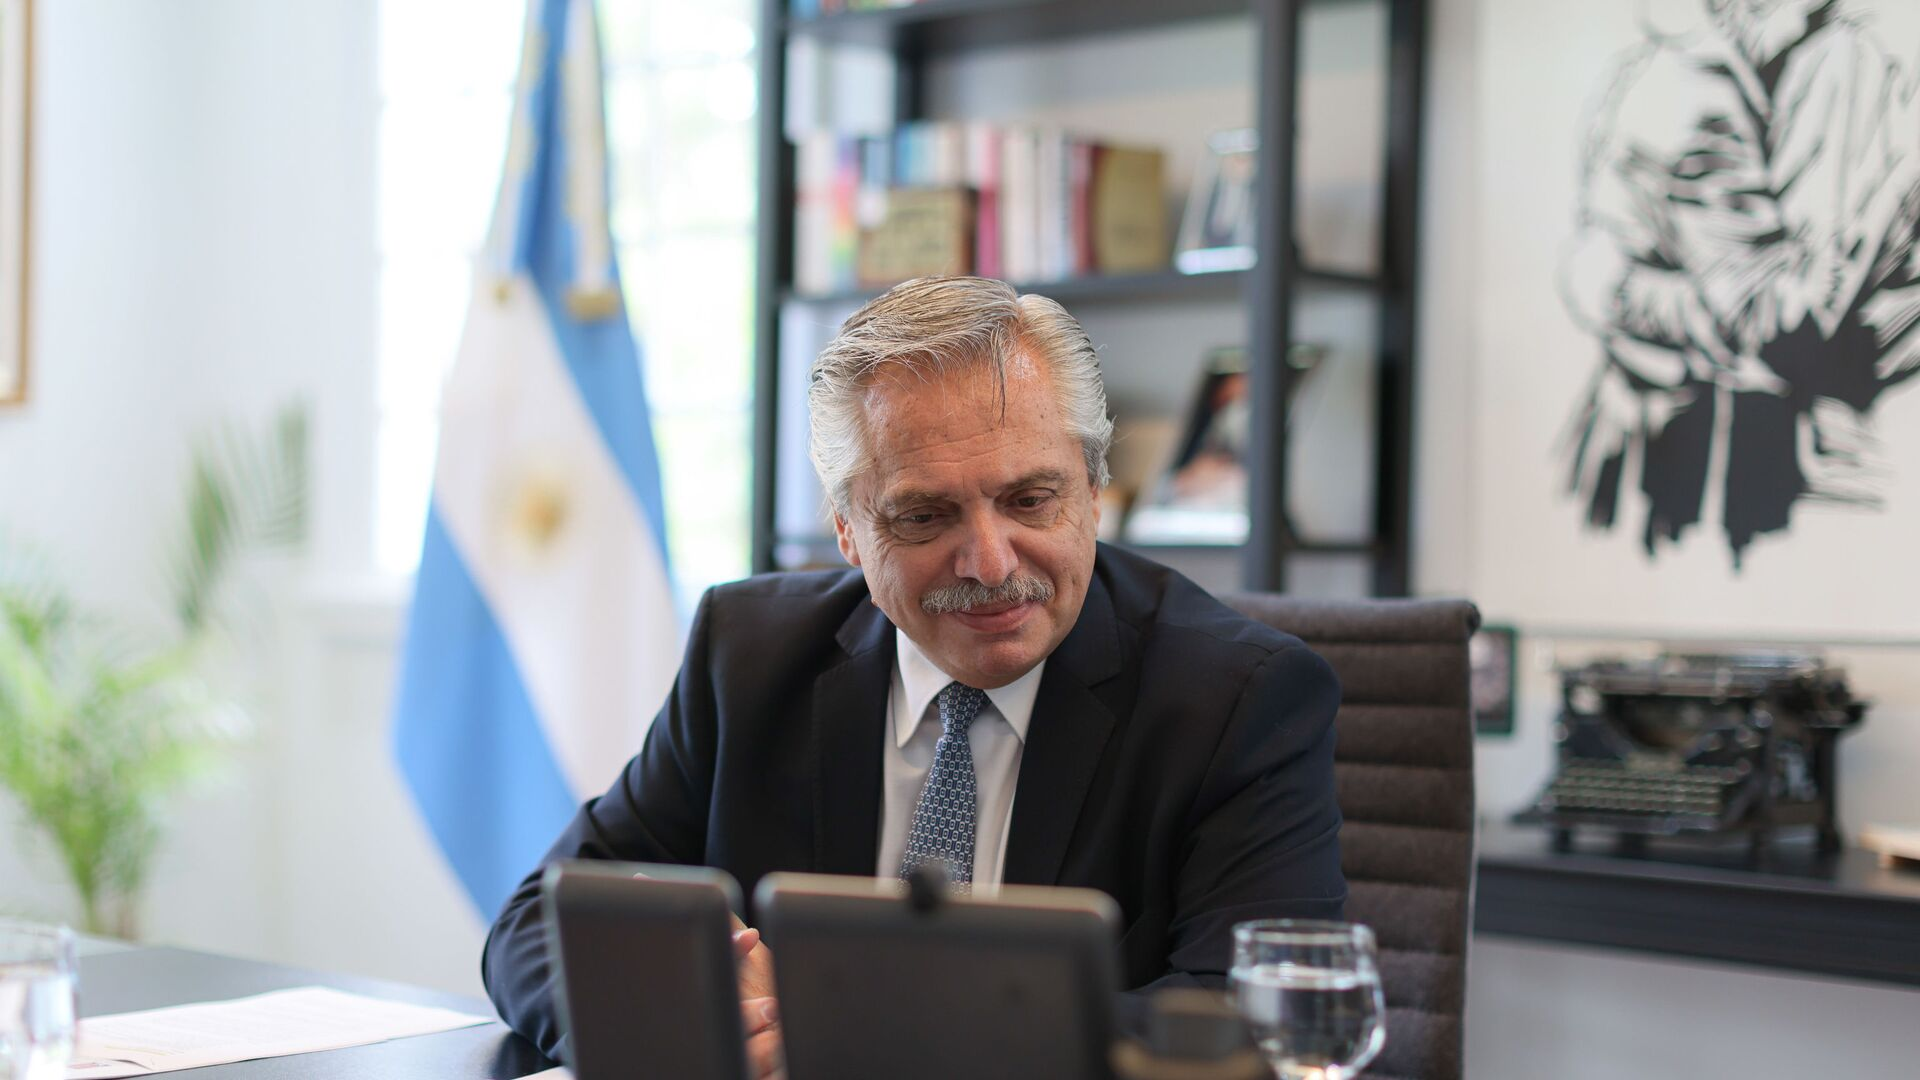 Alberto Fernández, presidente de Argentina - Sputnik Mundo, 1920, 02.02.2021